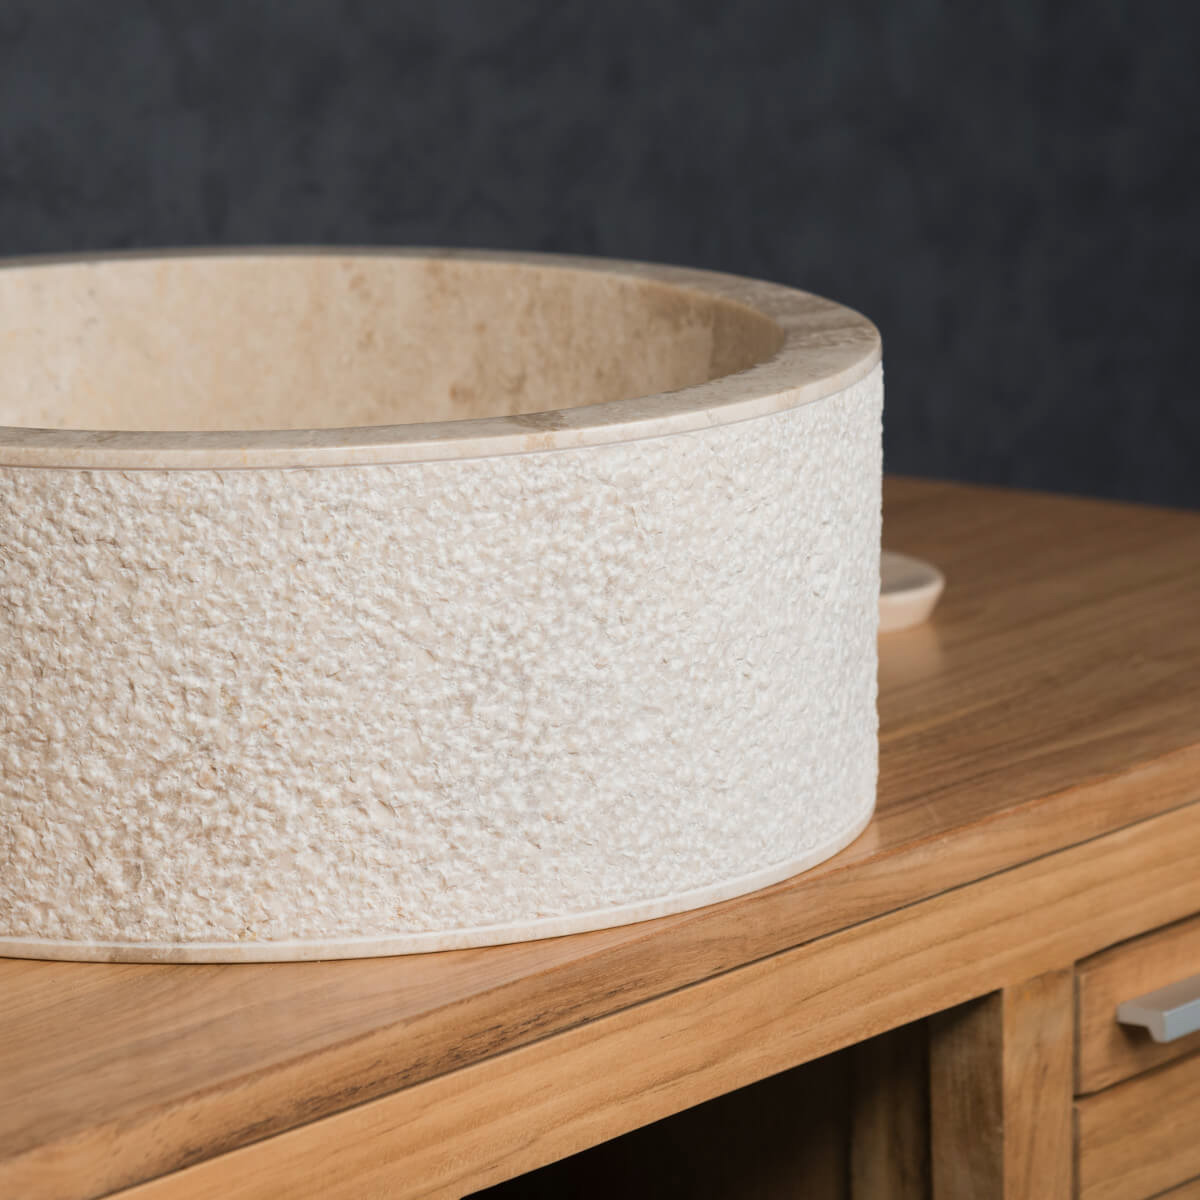 vasque poser marbre ronde cr me elbe l 40 x p. Black Bedroom Furniture Sets. Home Design Ideas